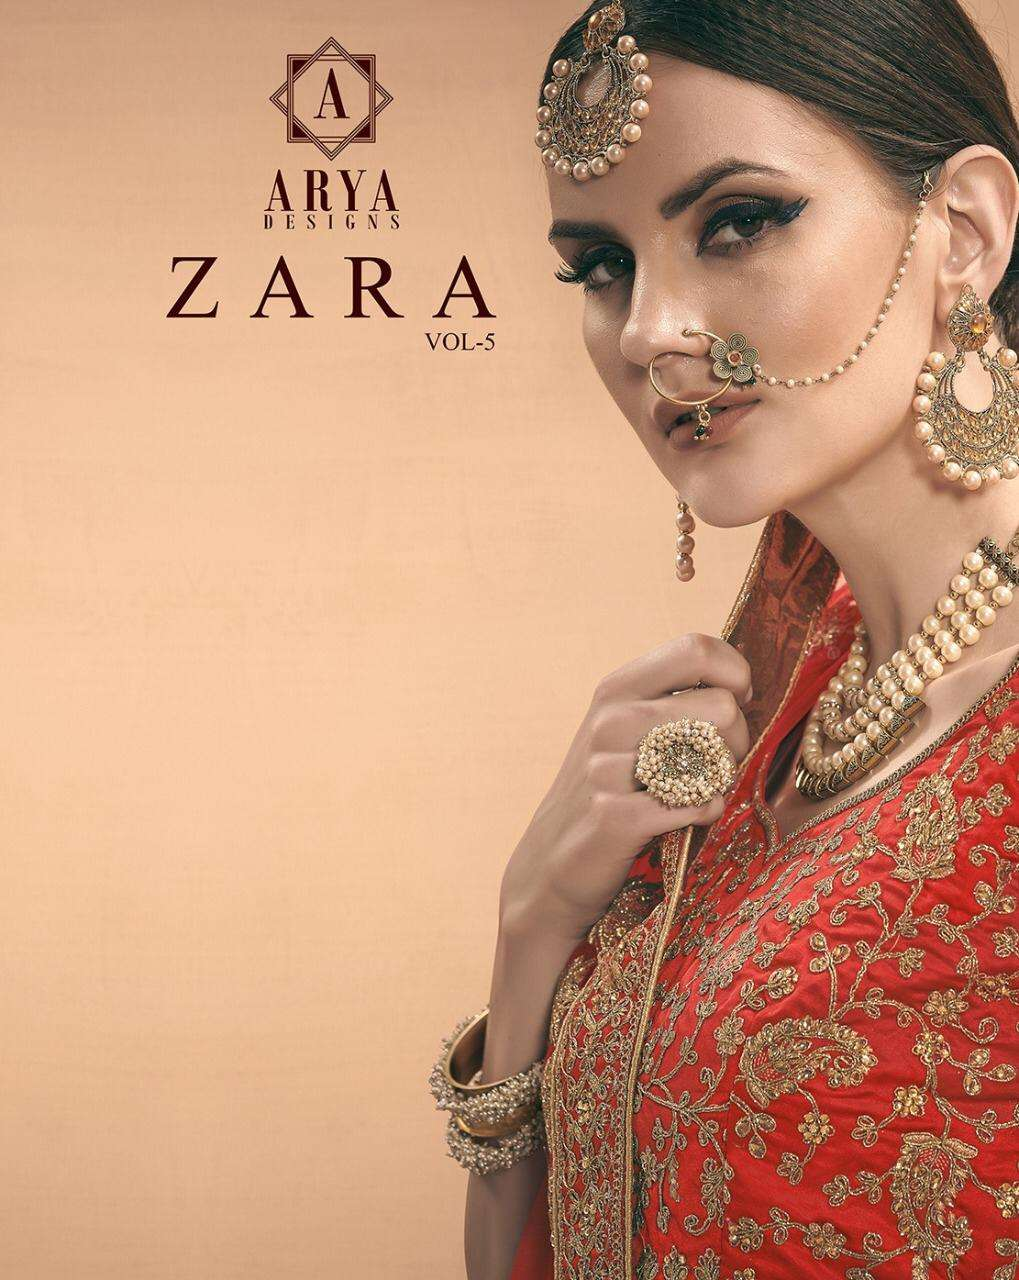 Zara Vol 5 By Arya Satin Embroidery Designer Lehenga